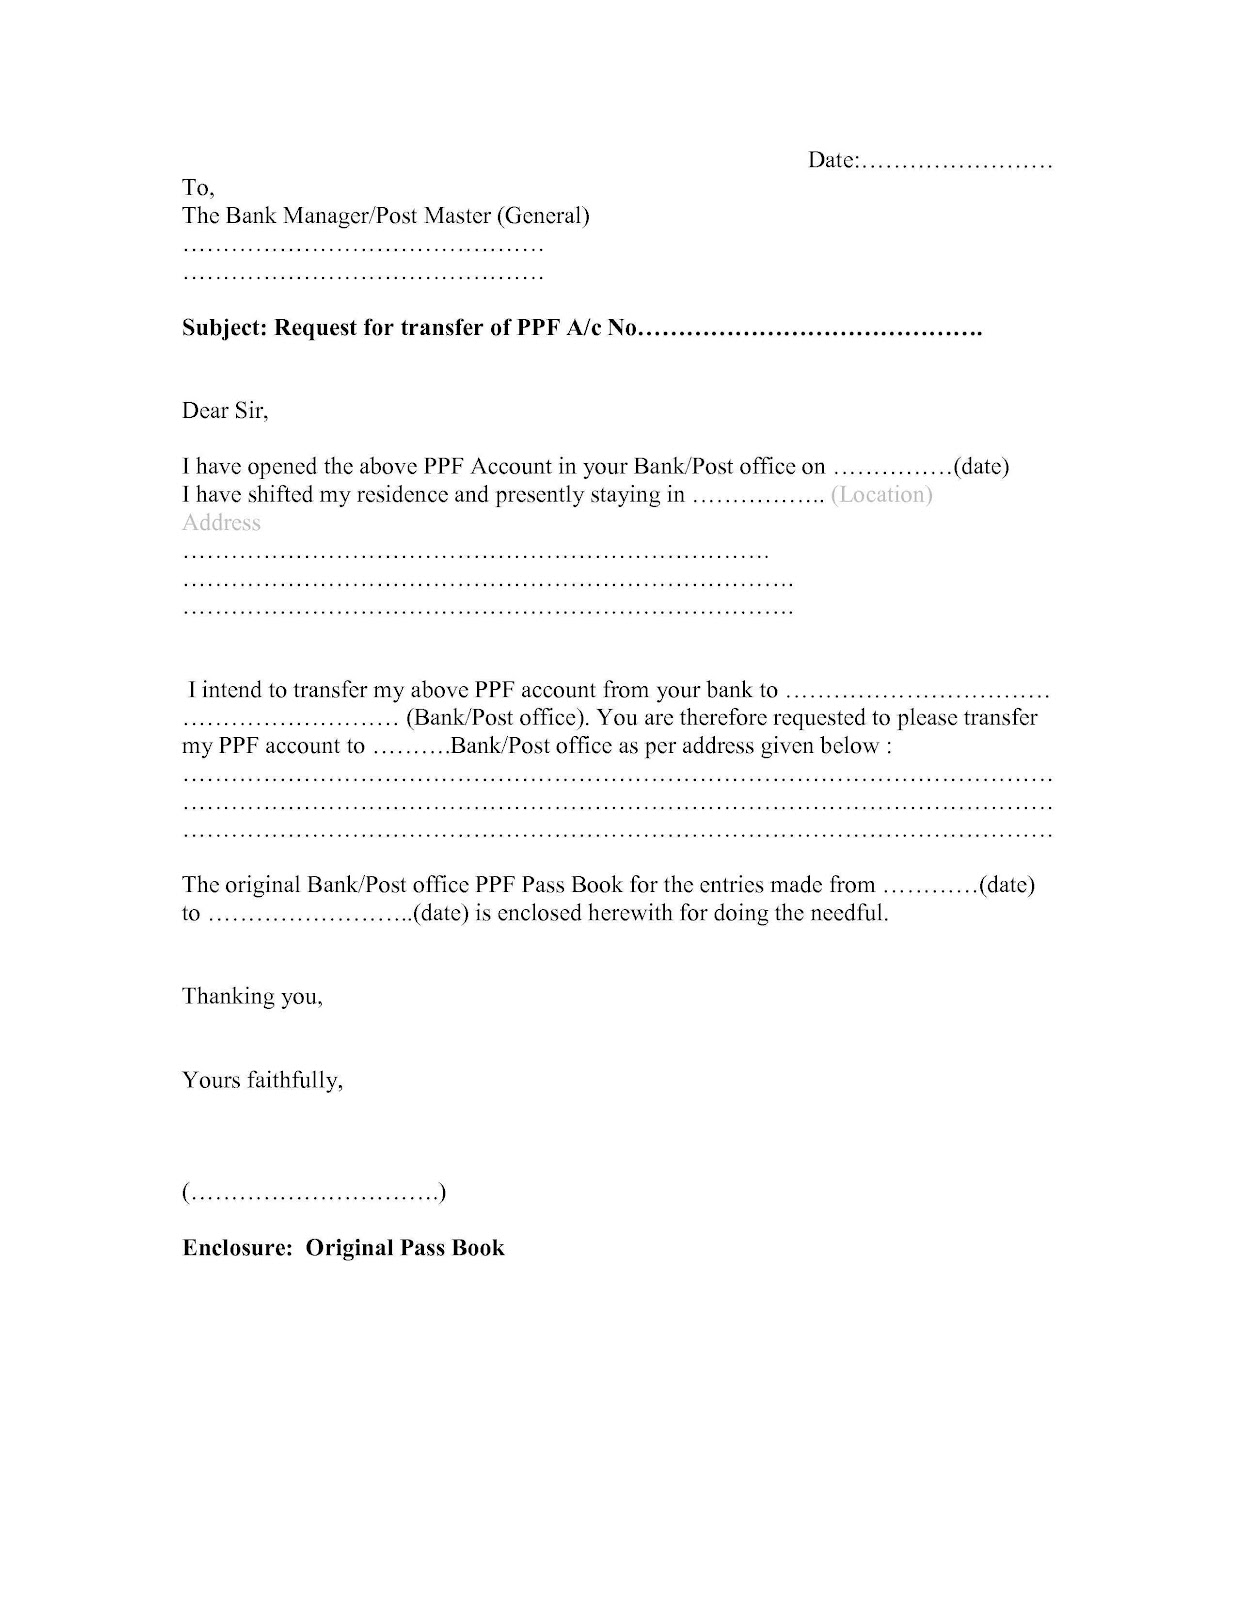 Mutual Fund Administrator Cover Letter | Portfolio Accountant Cover ...